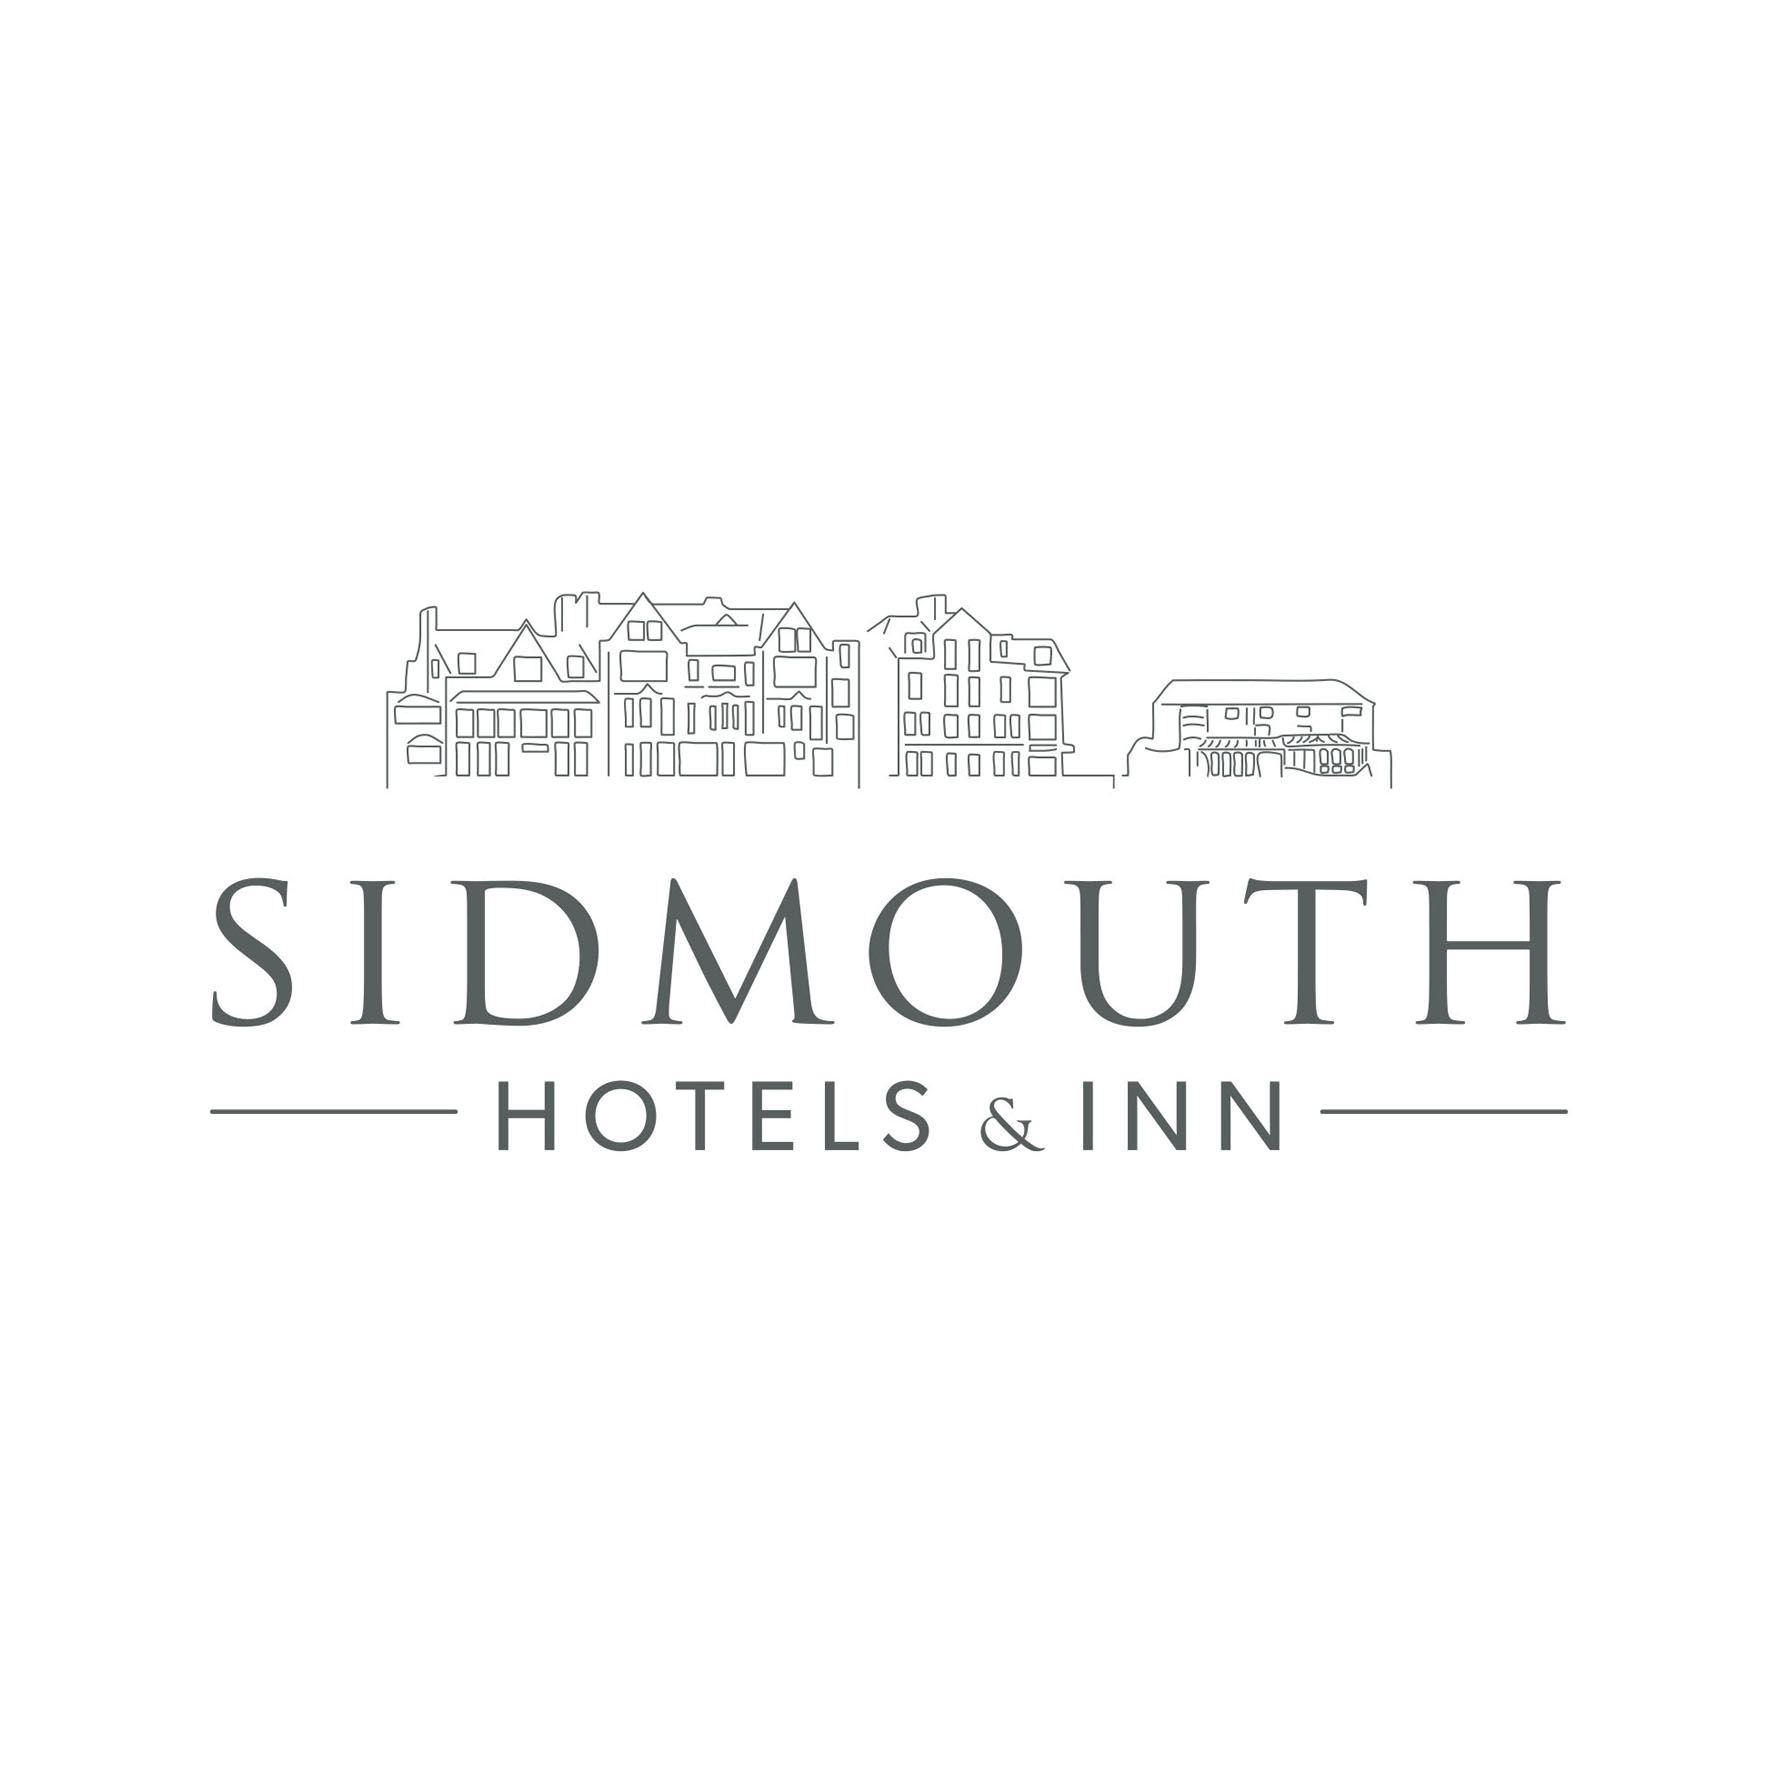 Sidmouth Hotels & Inn